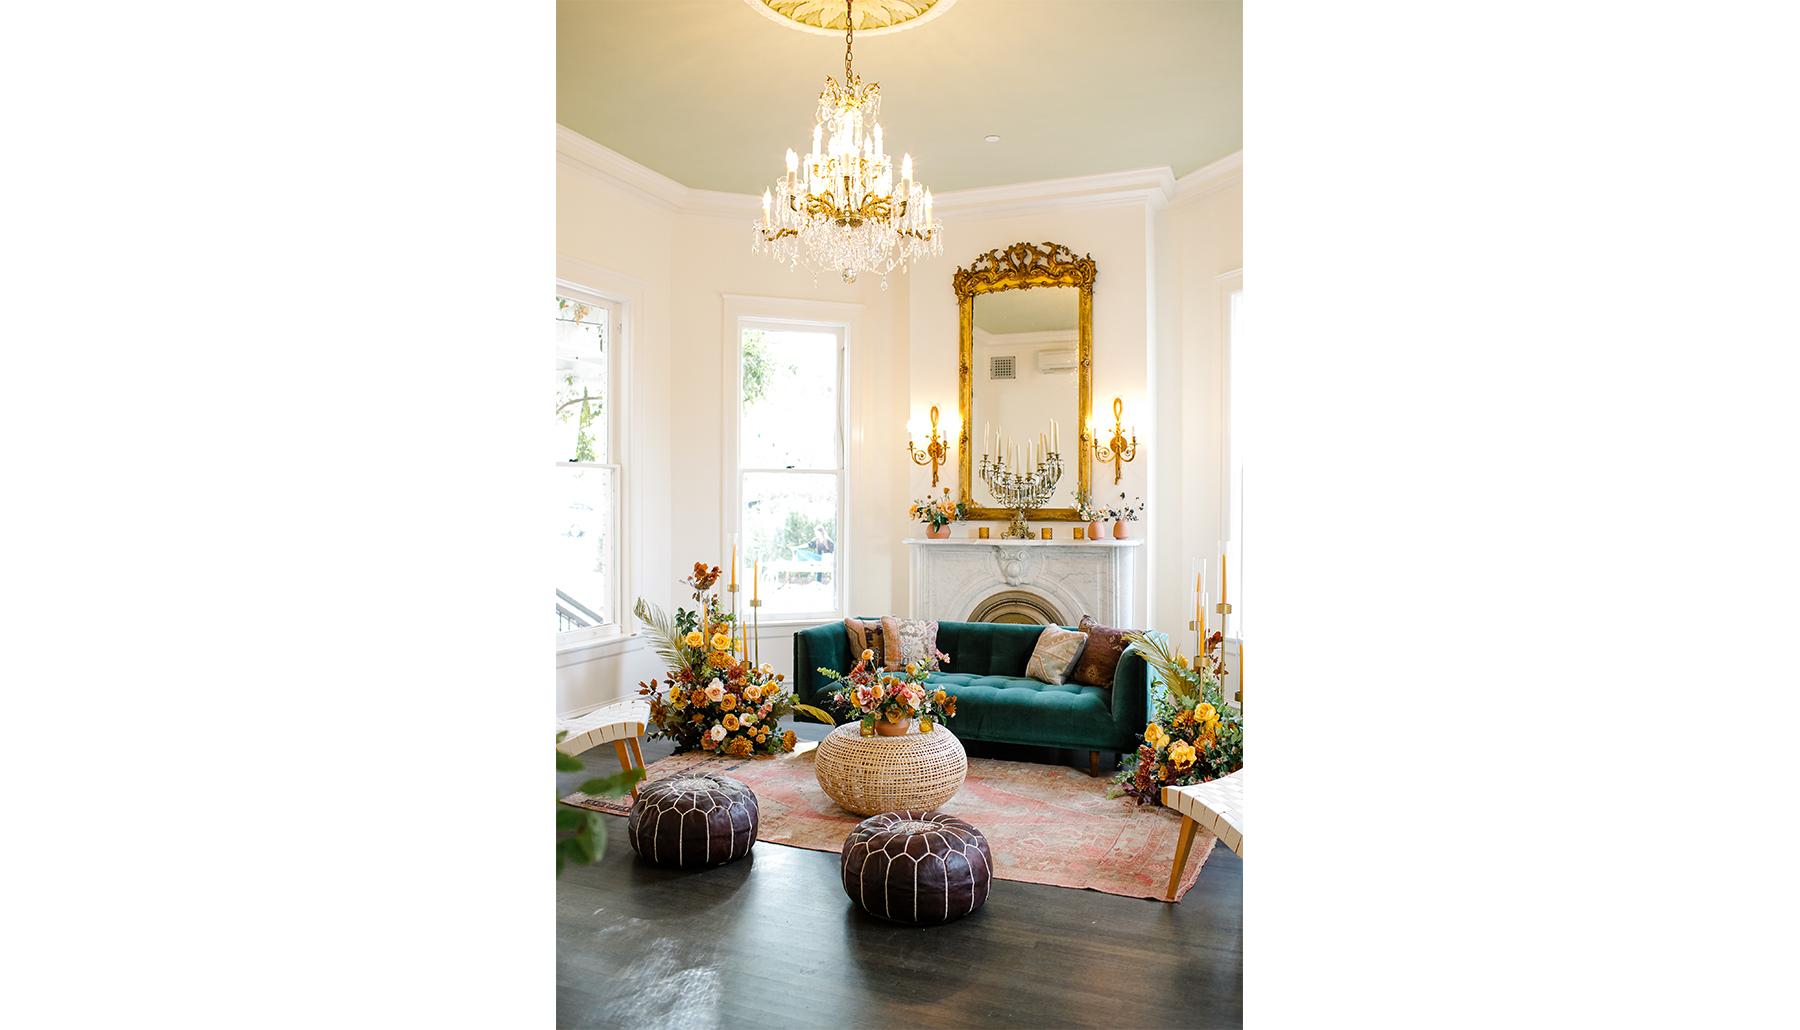 Woodbine Mansion Interior 2